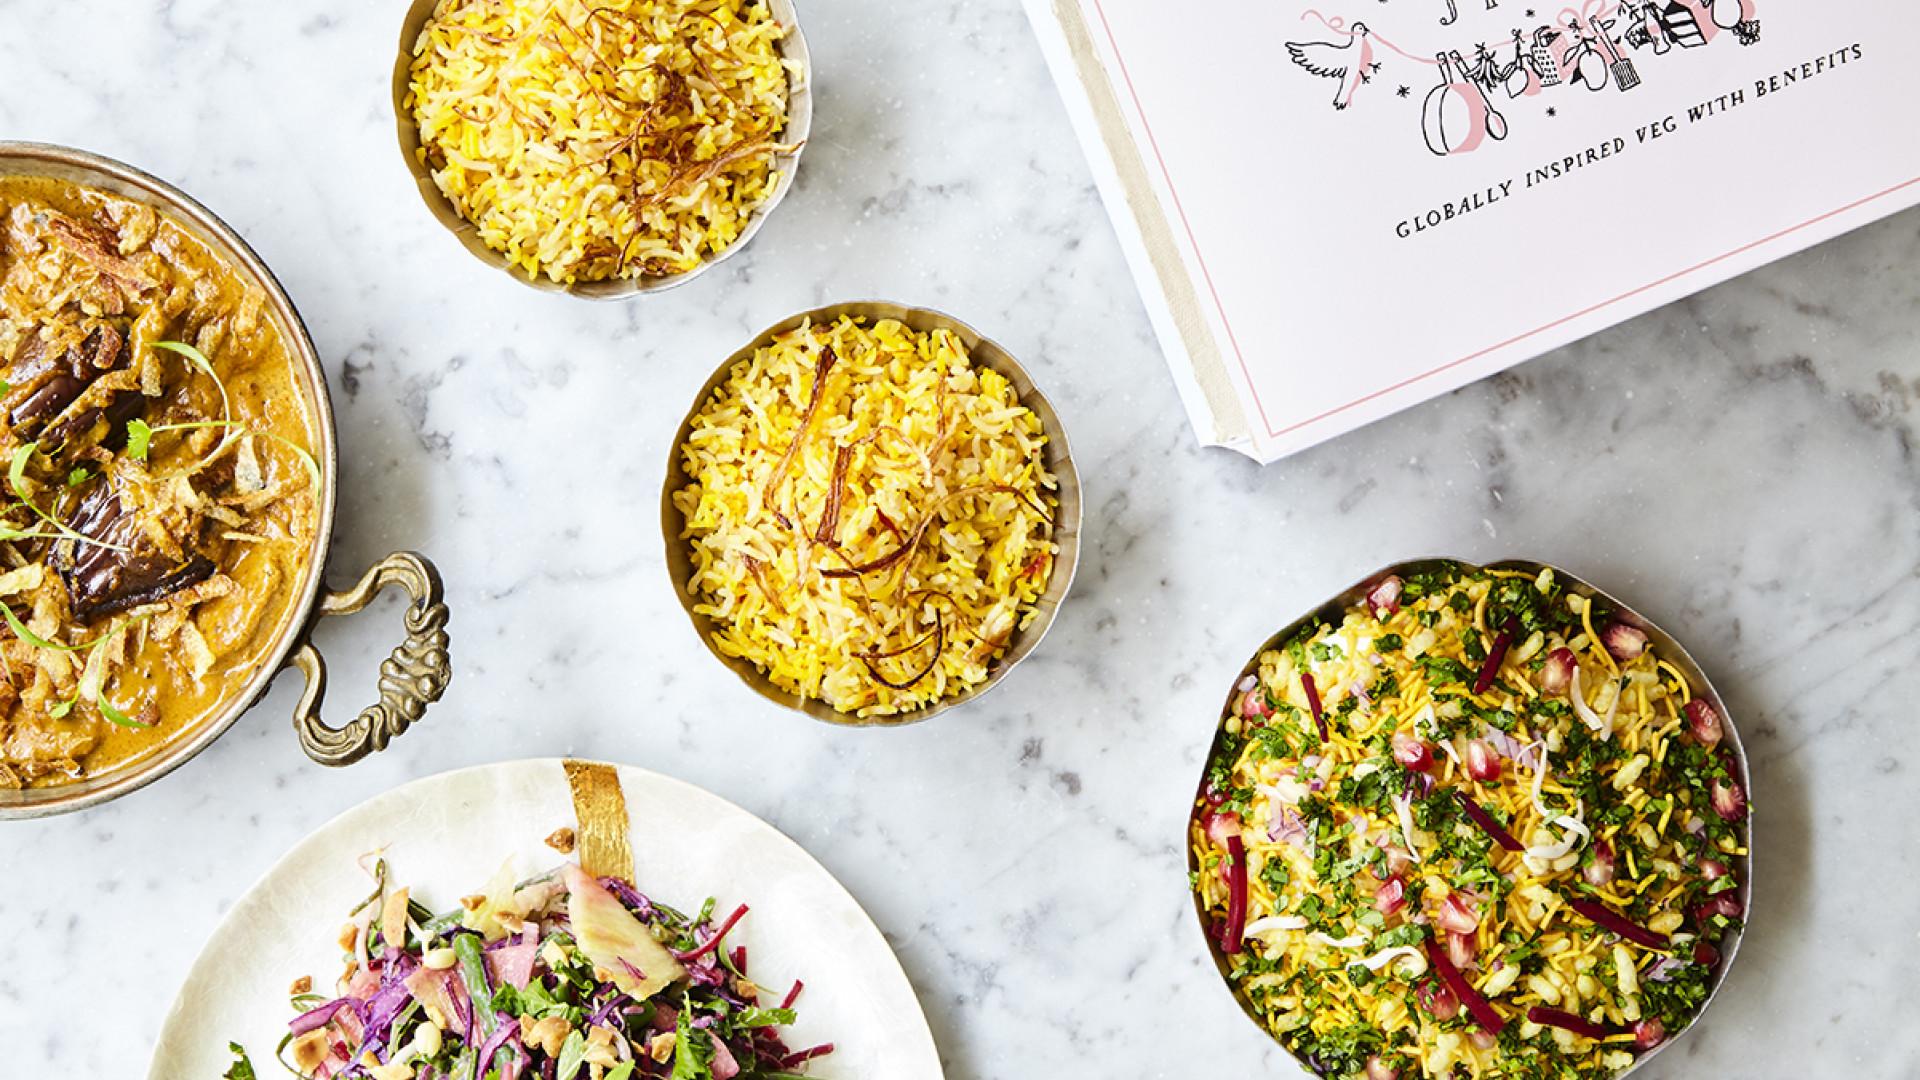 Vegan recipe and meal kits: Jikoni's comfort and joy boxes